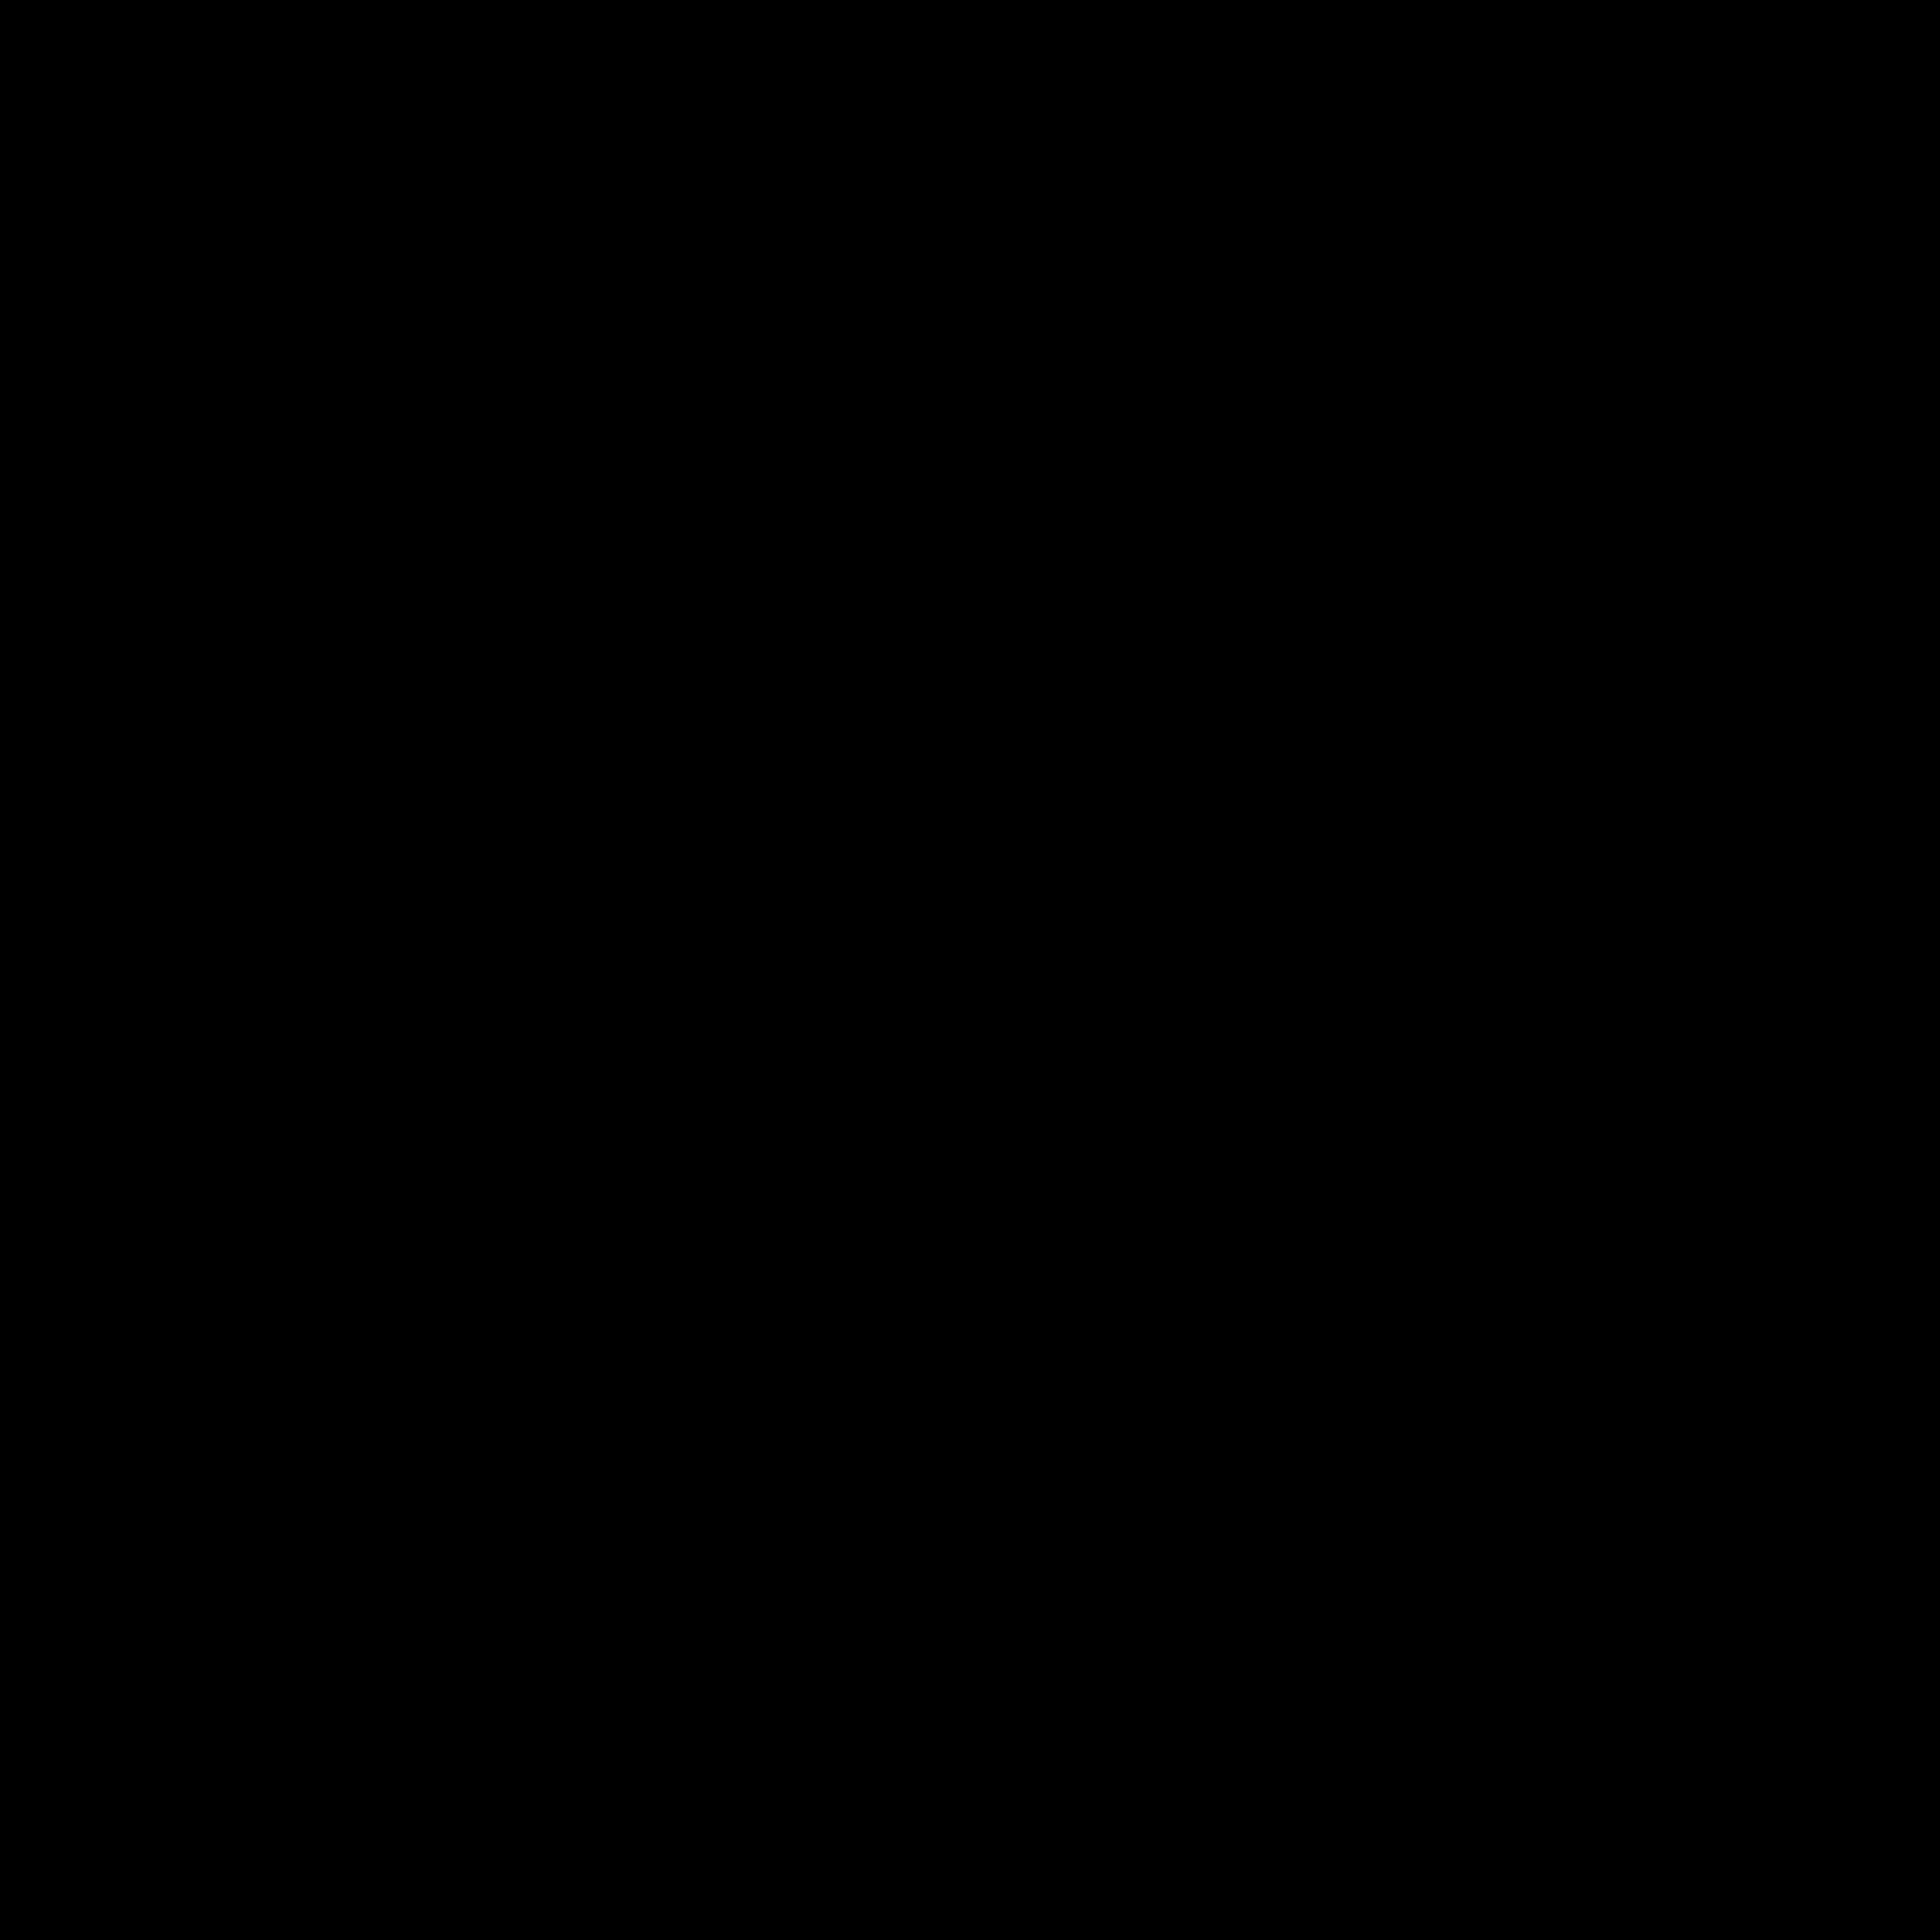 Ornament silhouette big image. Flourish clipart cross